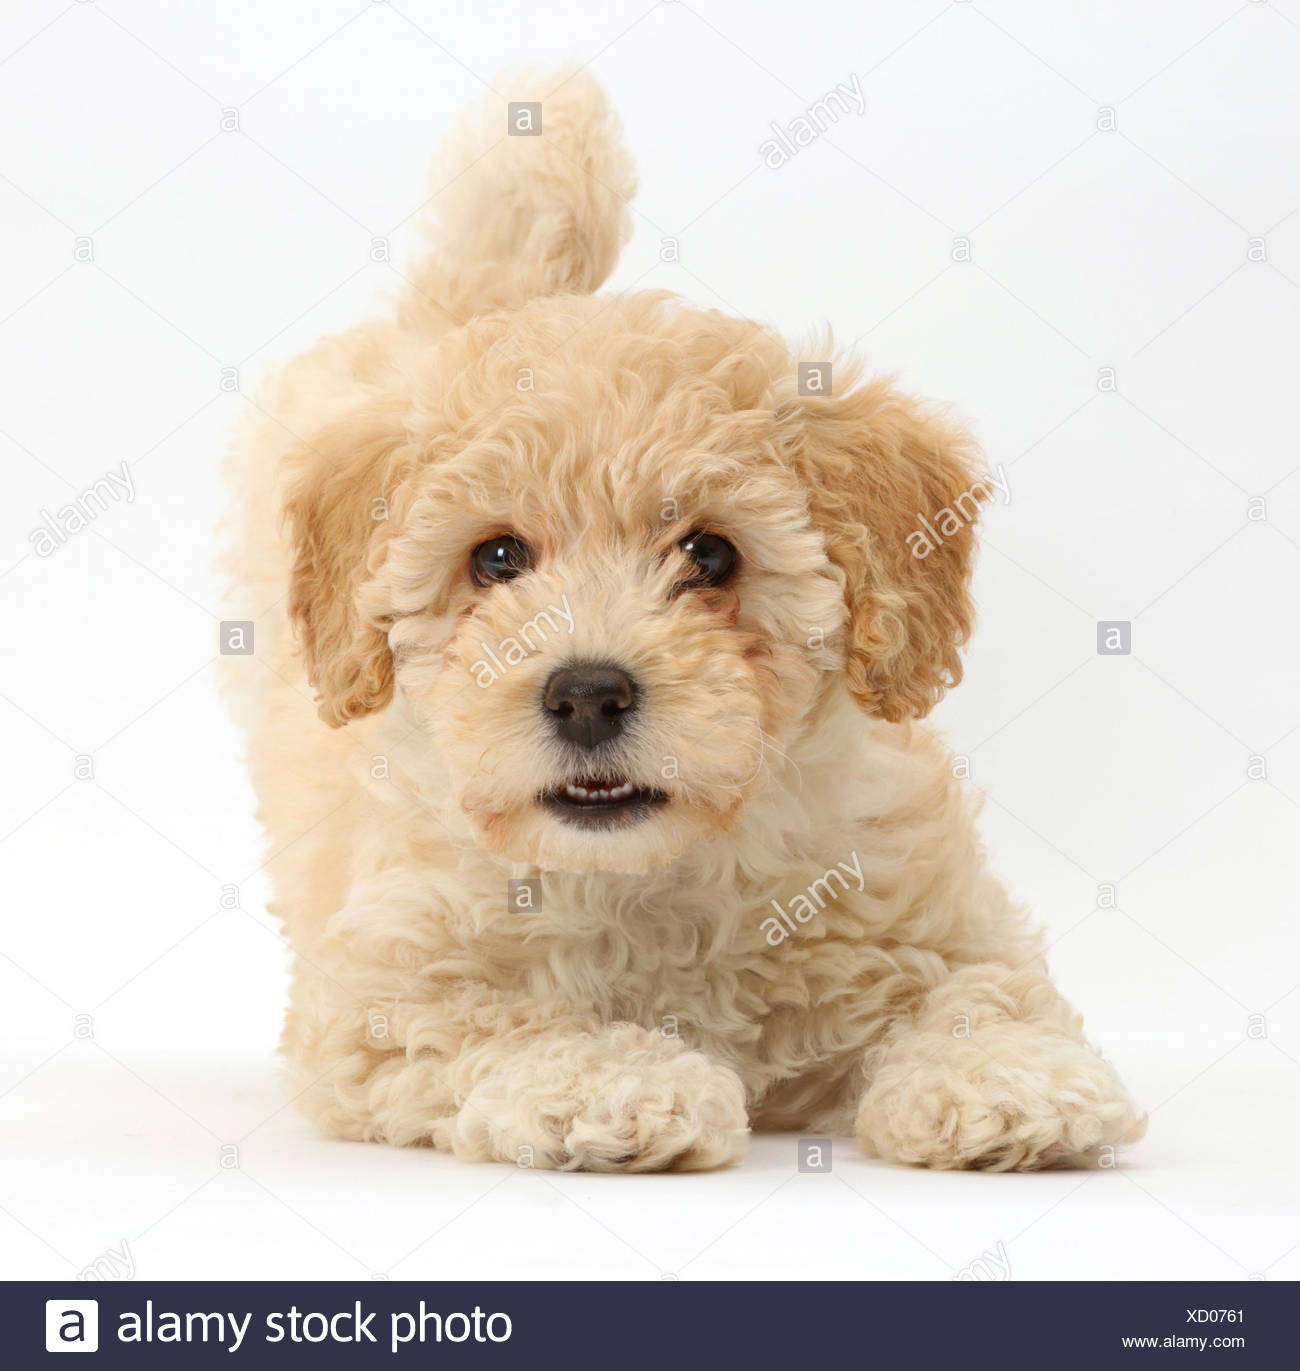 Poochon Puppy Bichon Frise Cross Poodle Age 6 Weeks Stock Photo